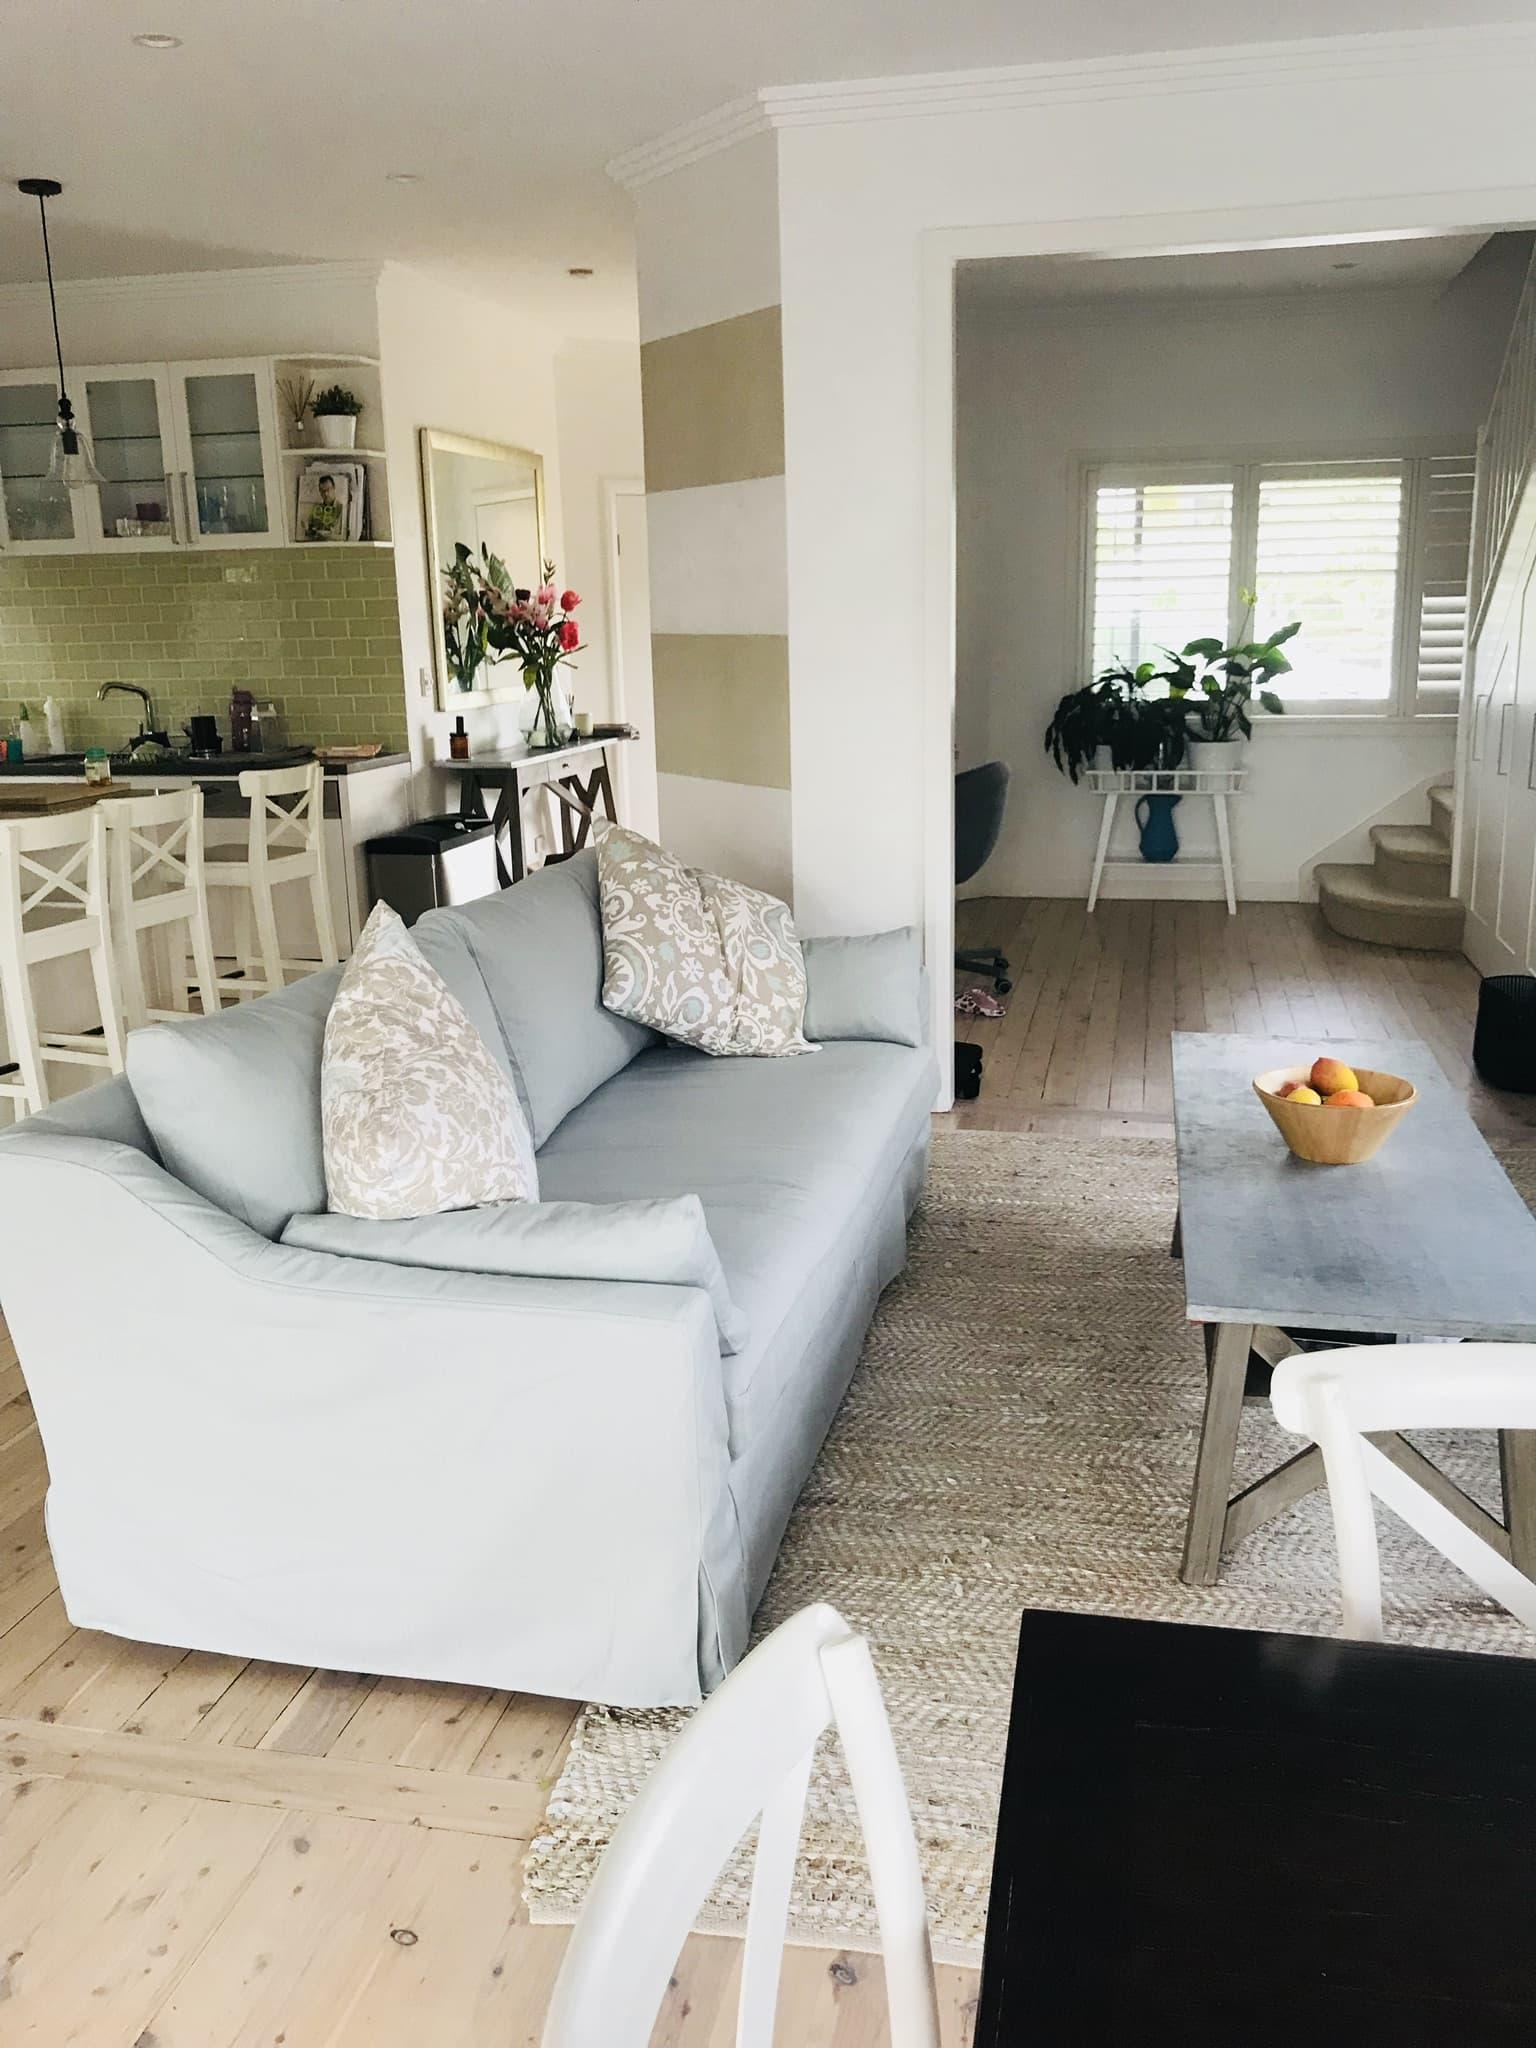 Farlov 2 Seater Sofa Cover Comfort Works